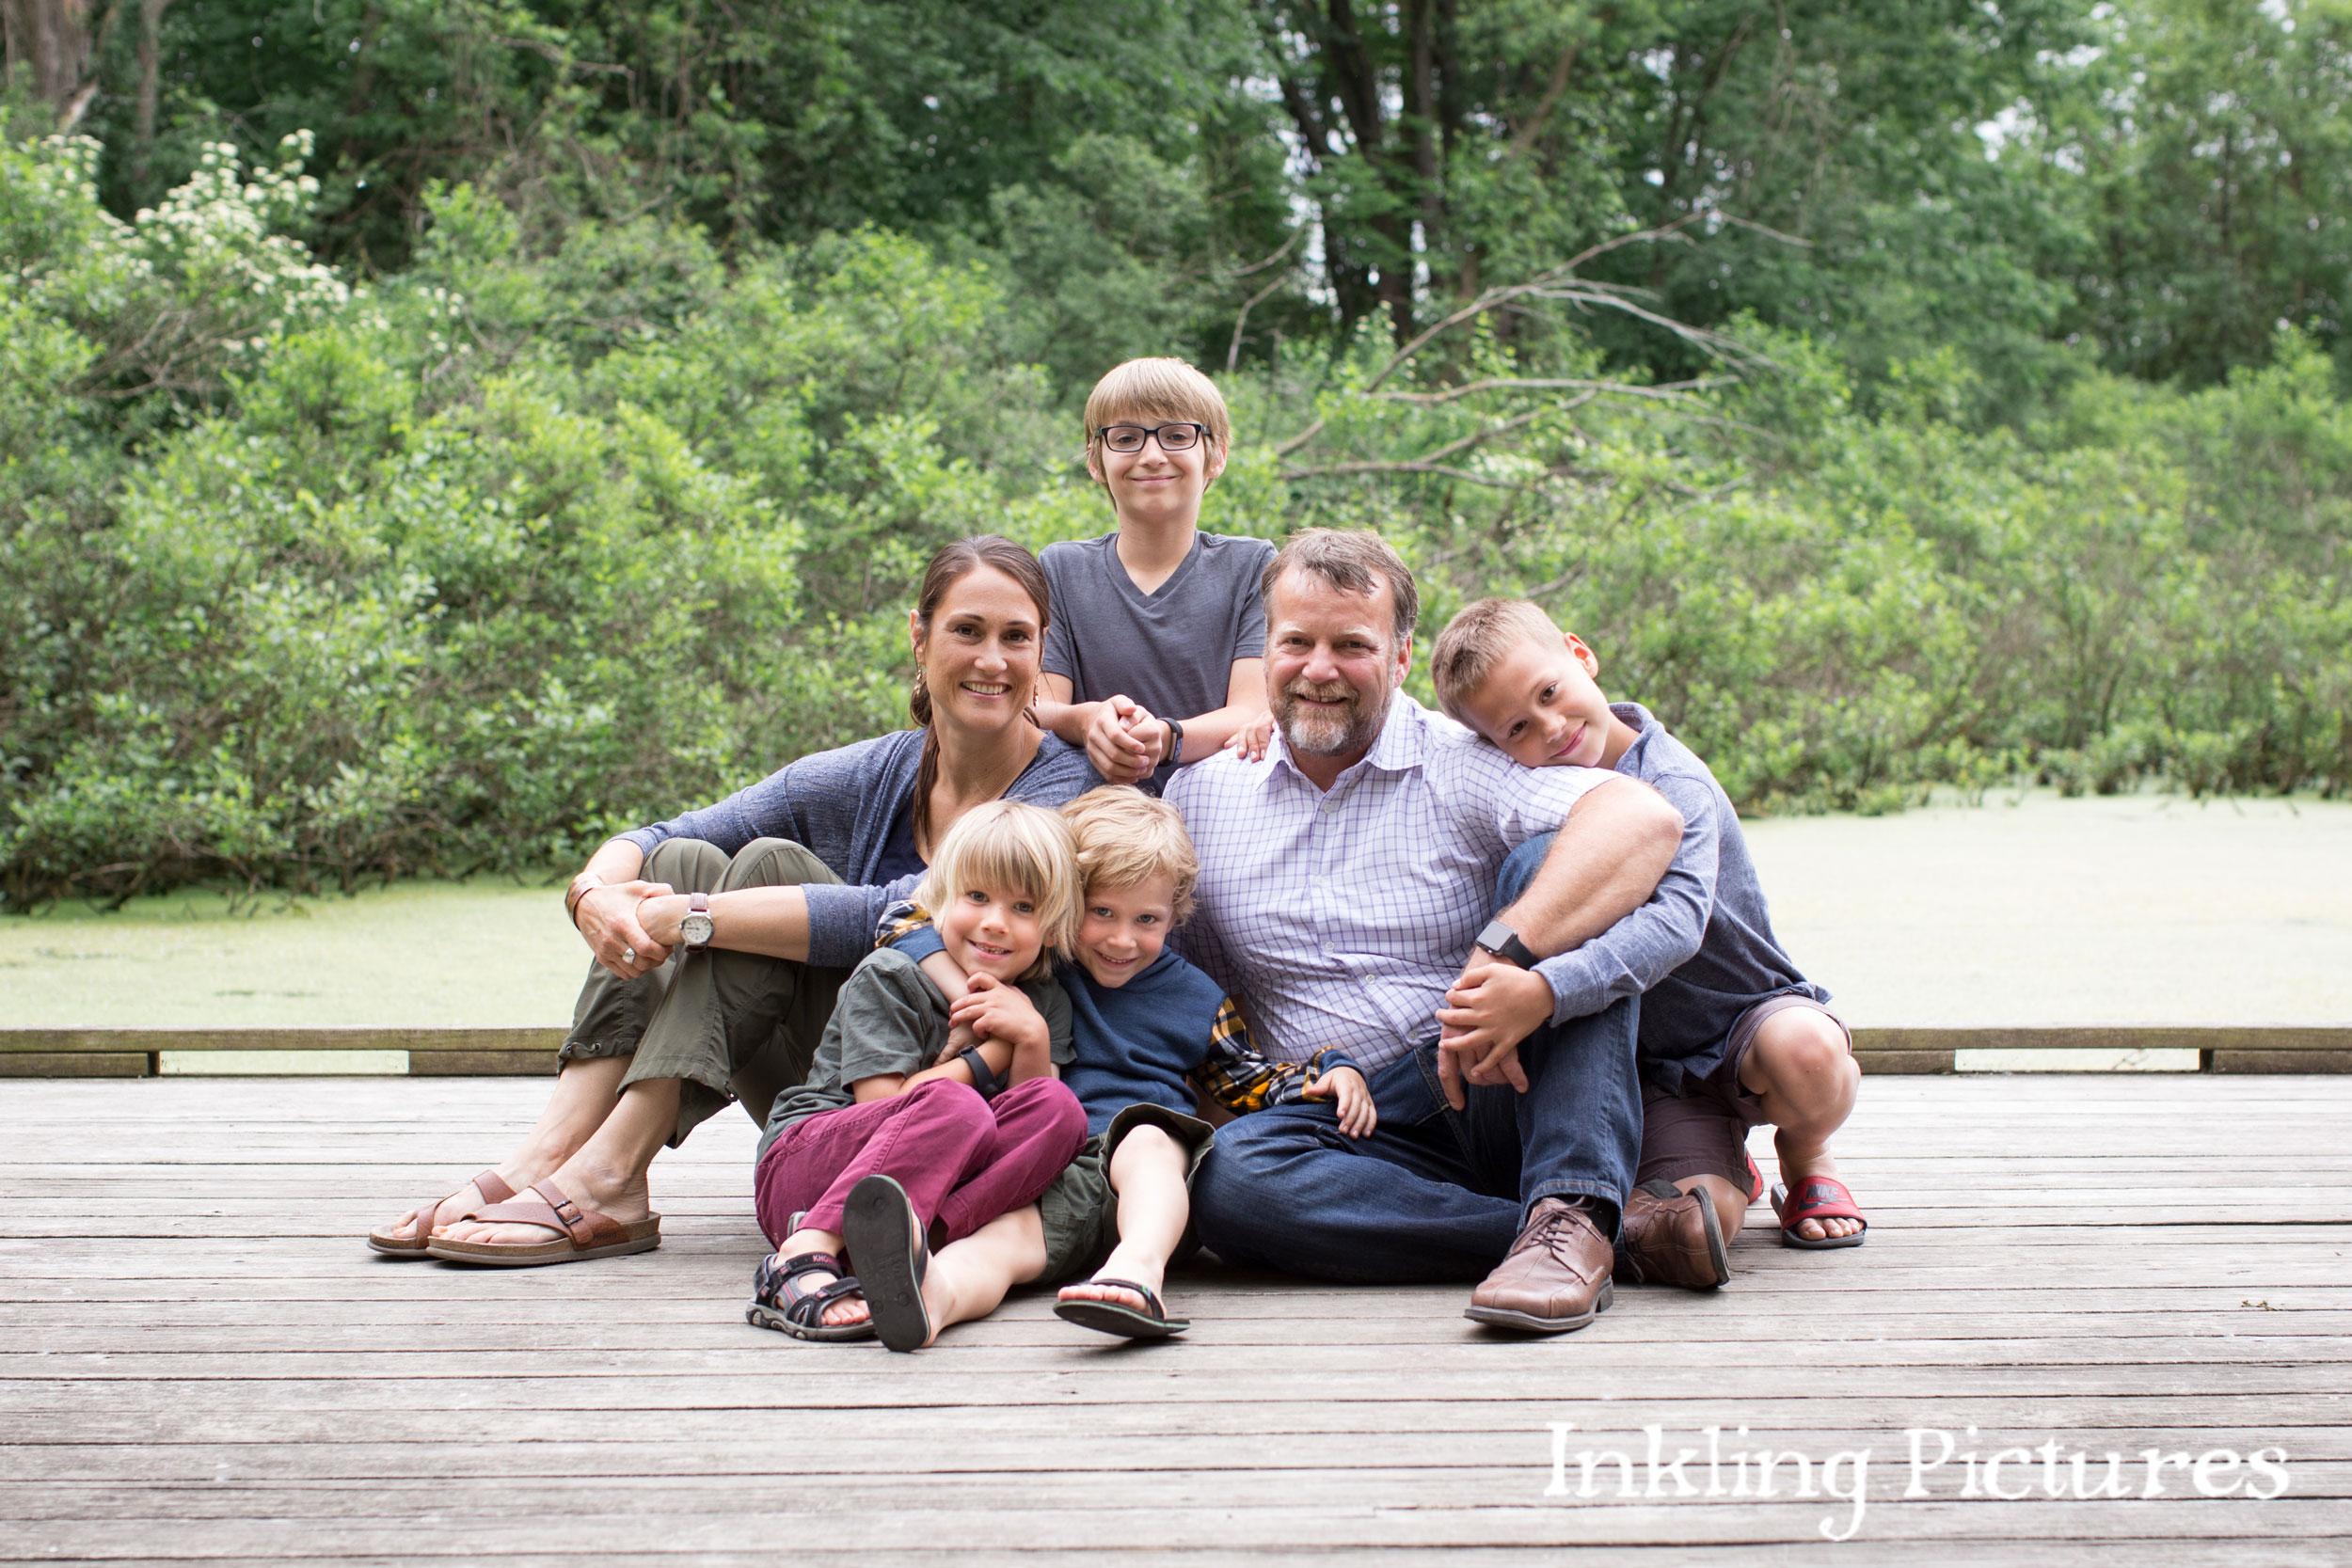 Koole-Family-Photo-1.jpg